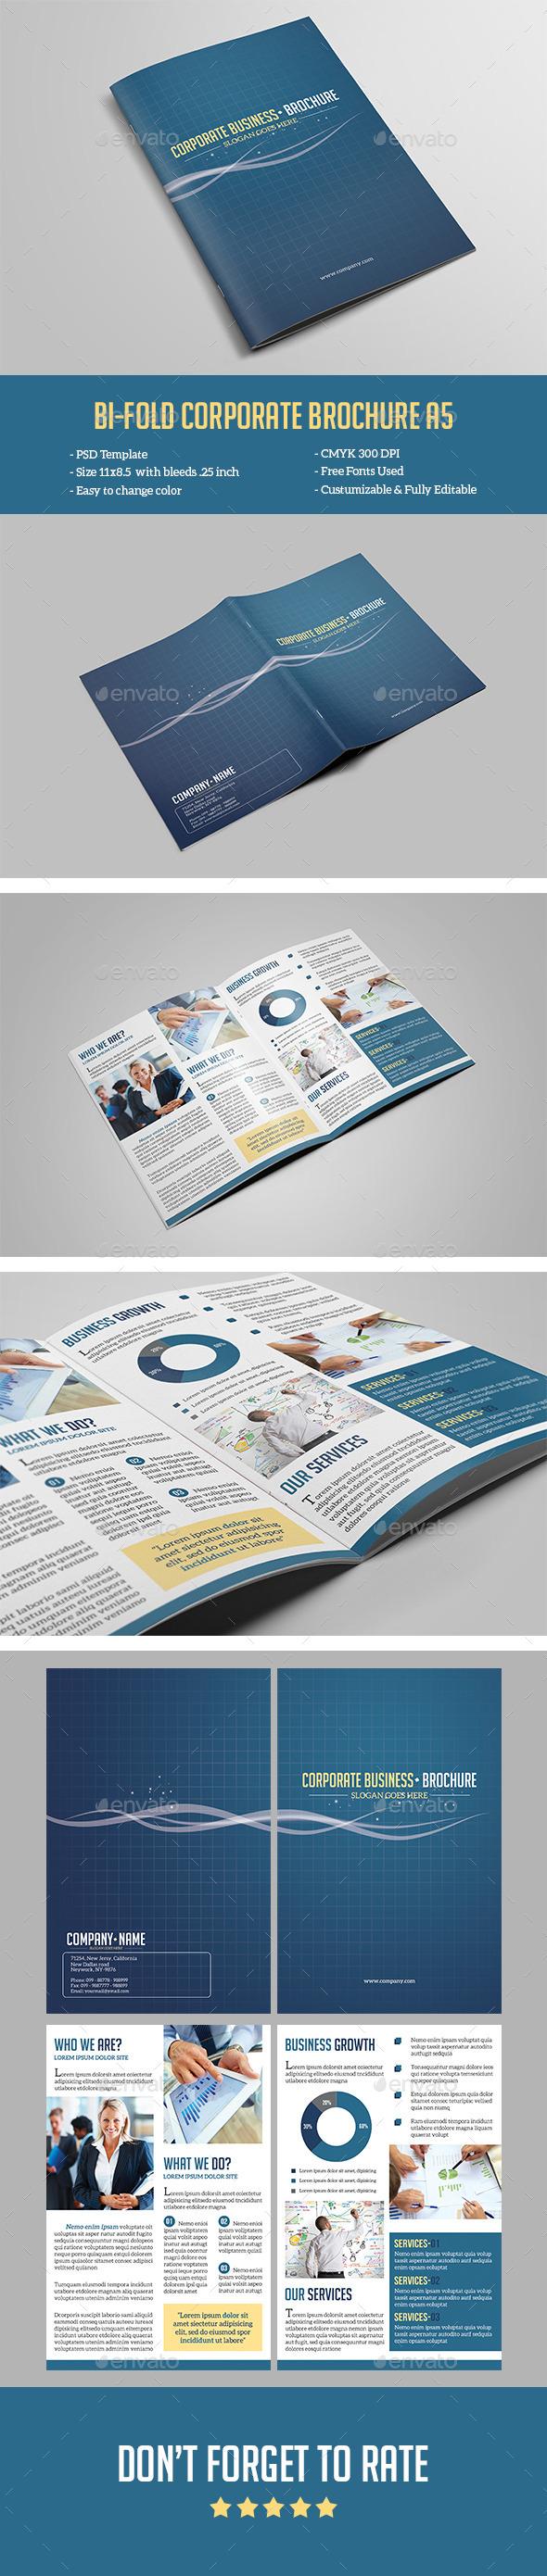 Bi-Fold Corporate Brochure V2 - Corporate Brochures